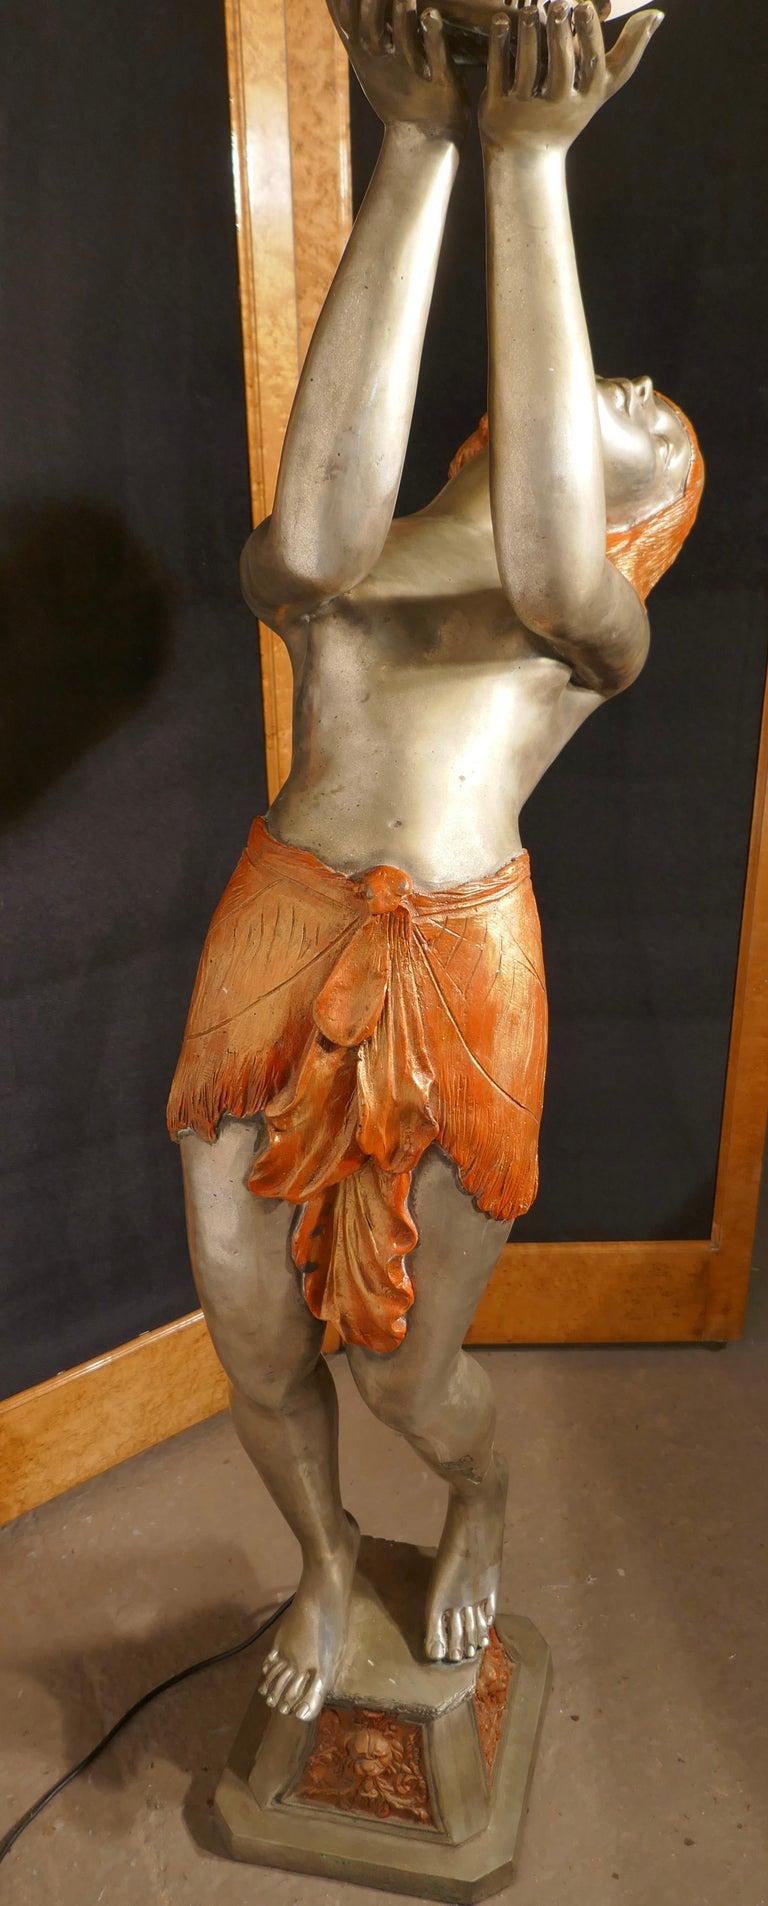 Brass Large Art Deco Female Sculpture Floor Lamp, after Auguste Moreau Signed For Sale